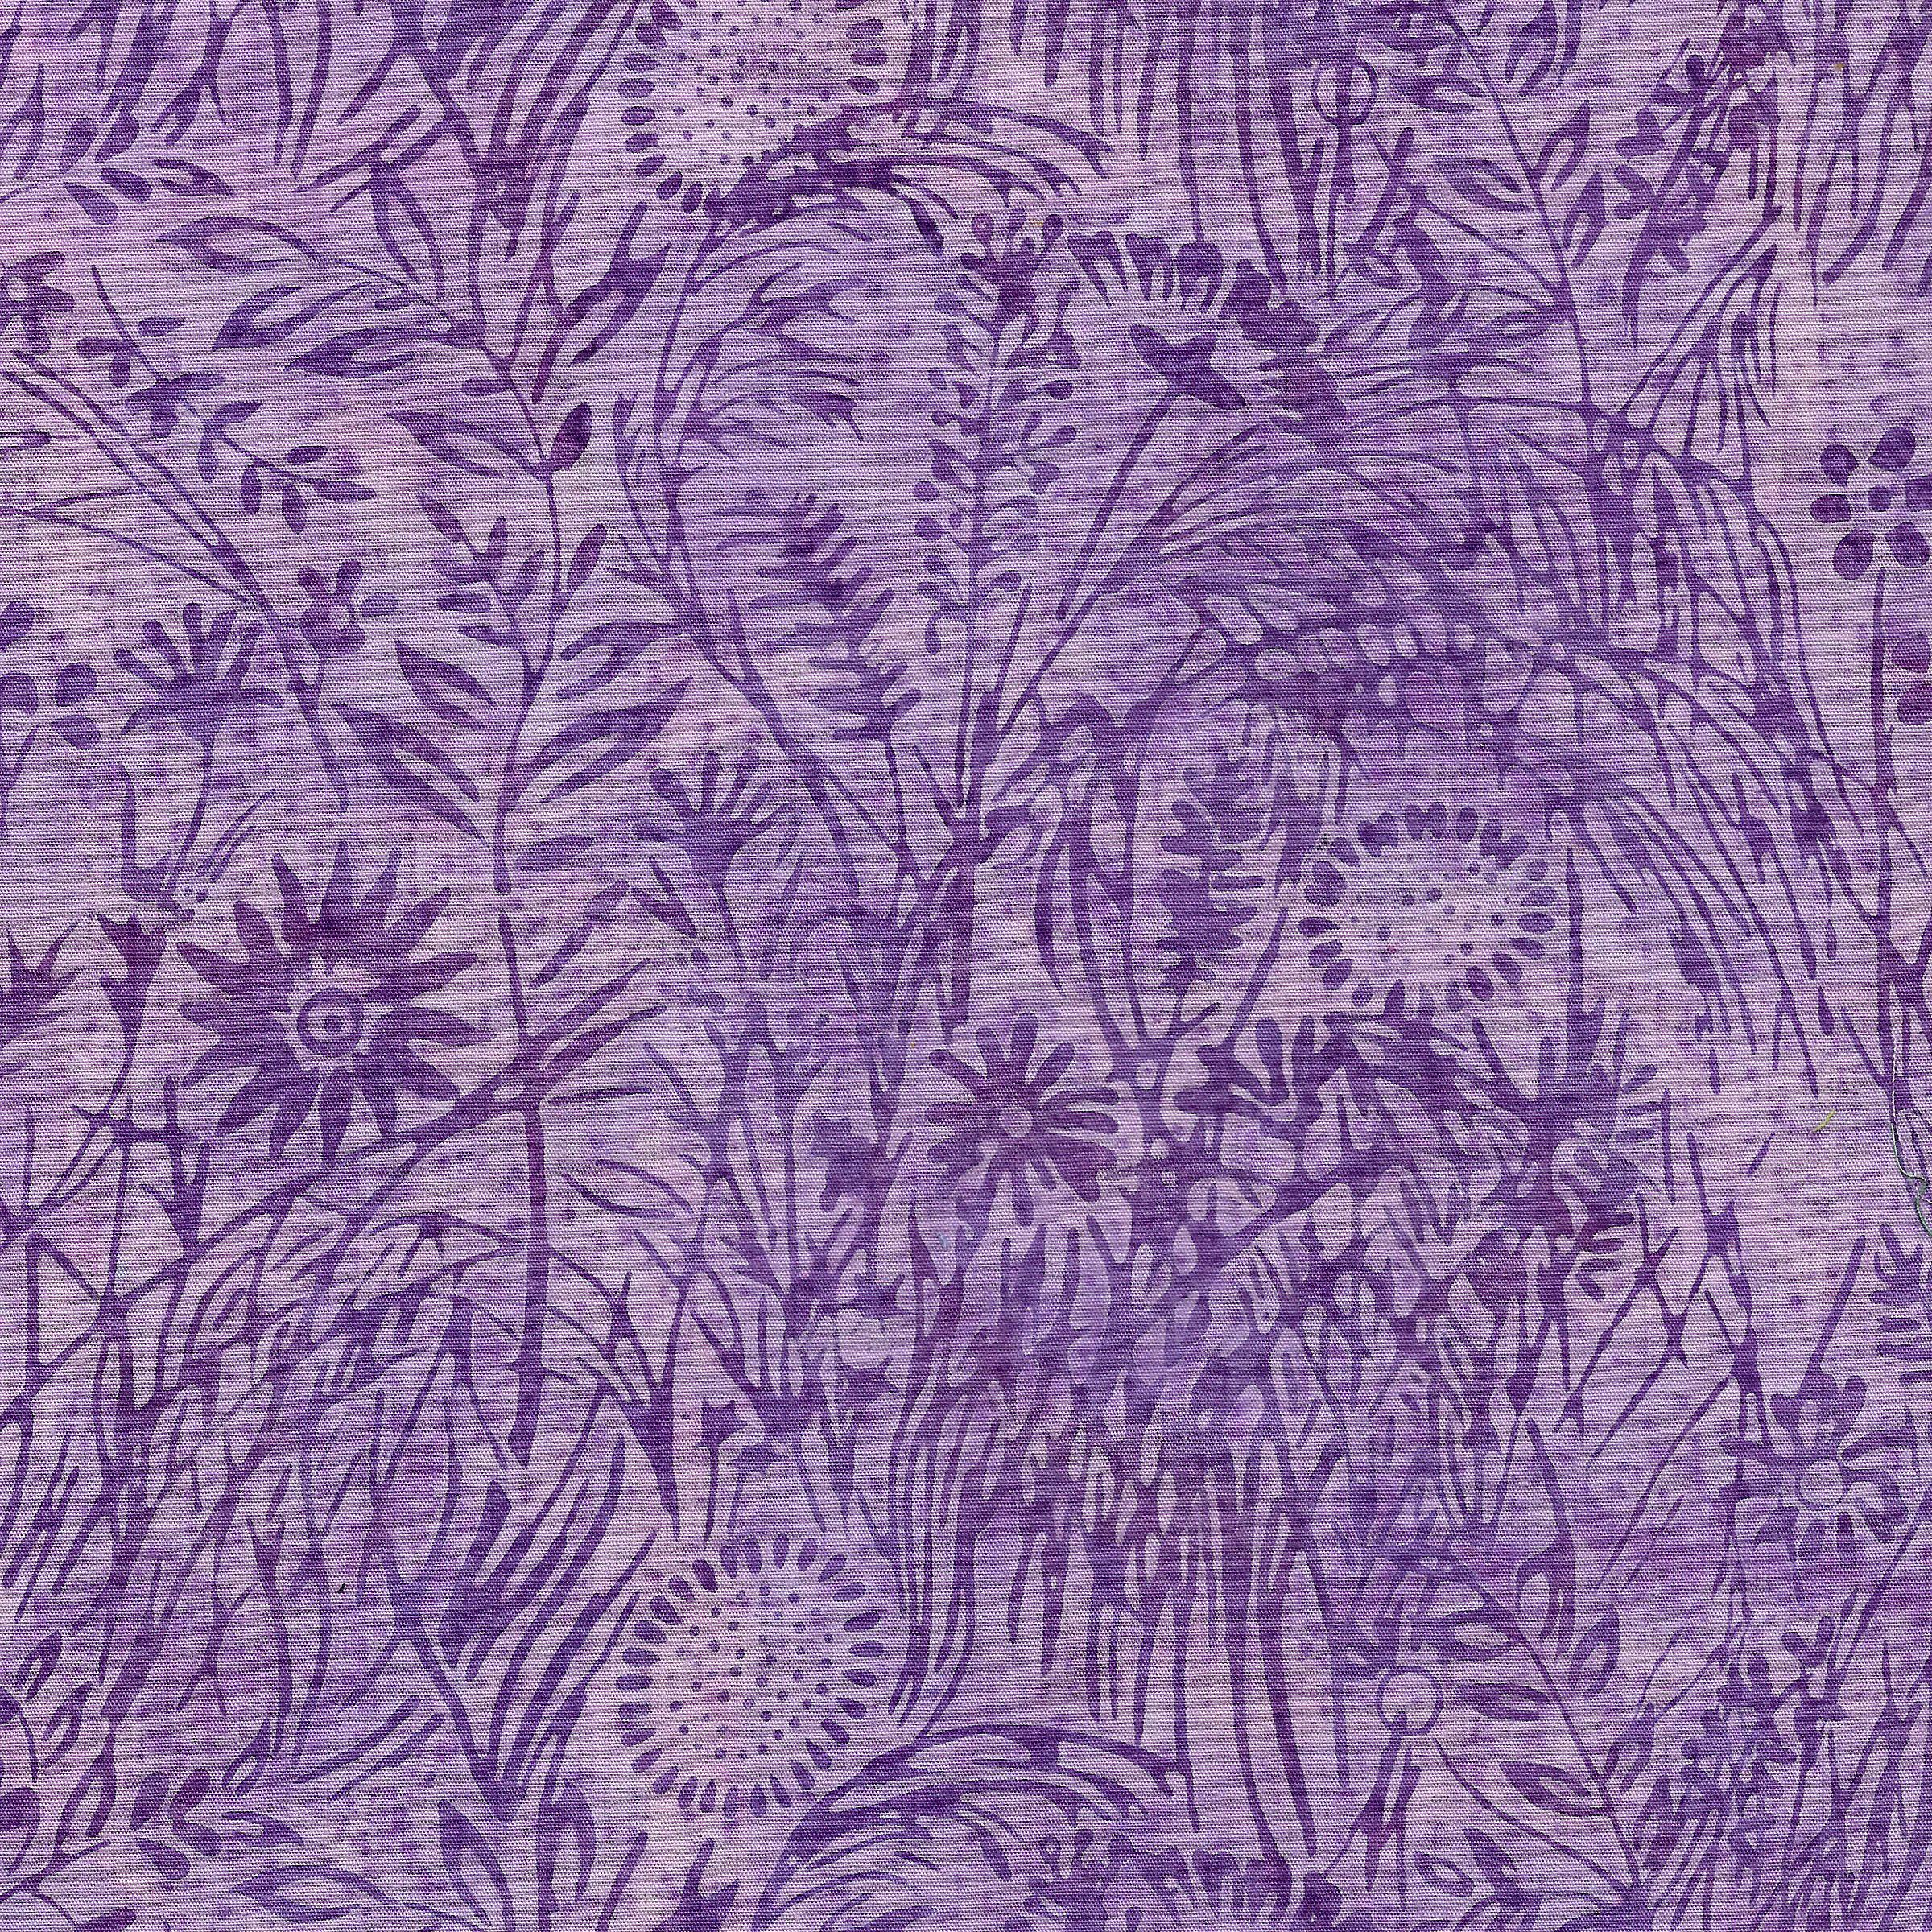 IB- Wildflower-Lavender Batik